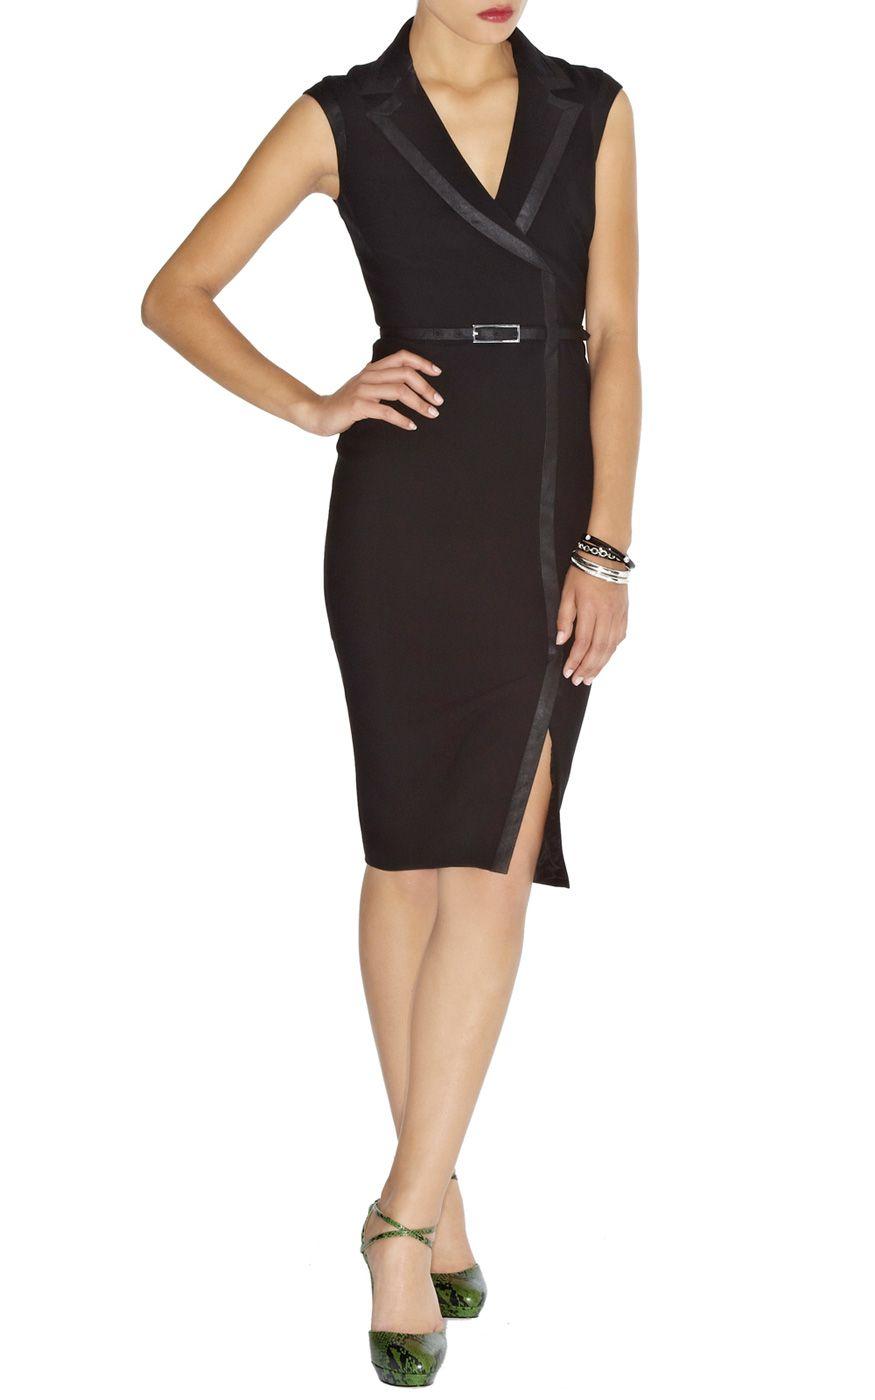 Black dress karen millen - Fashion Karen Millen Dresses On Sale Cheap Karen Millen Online Shop